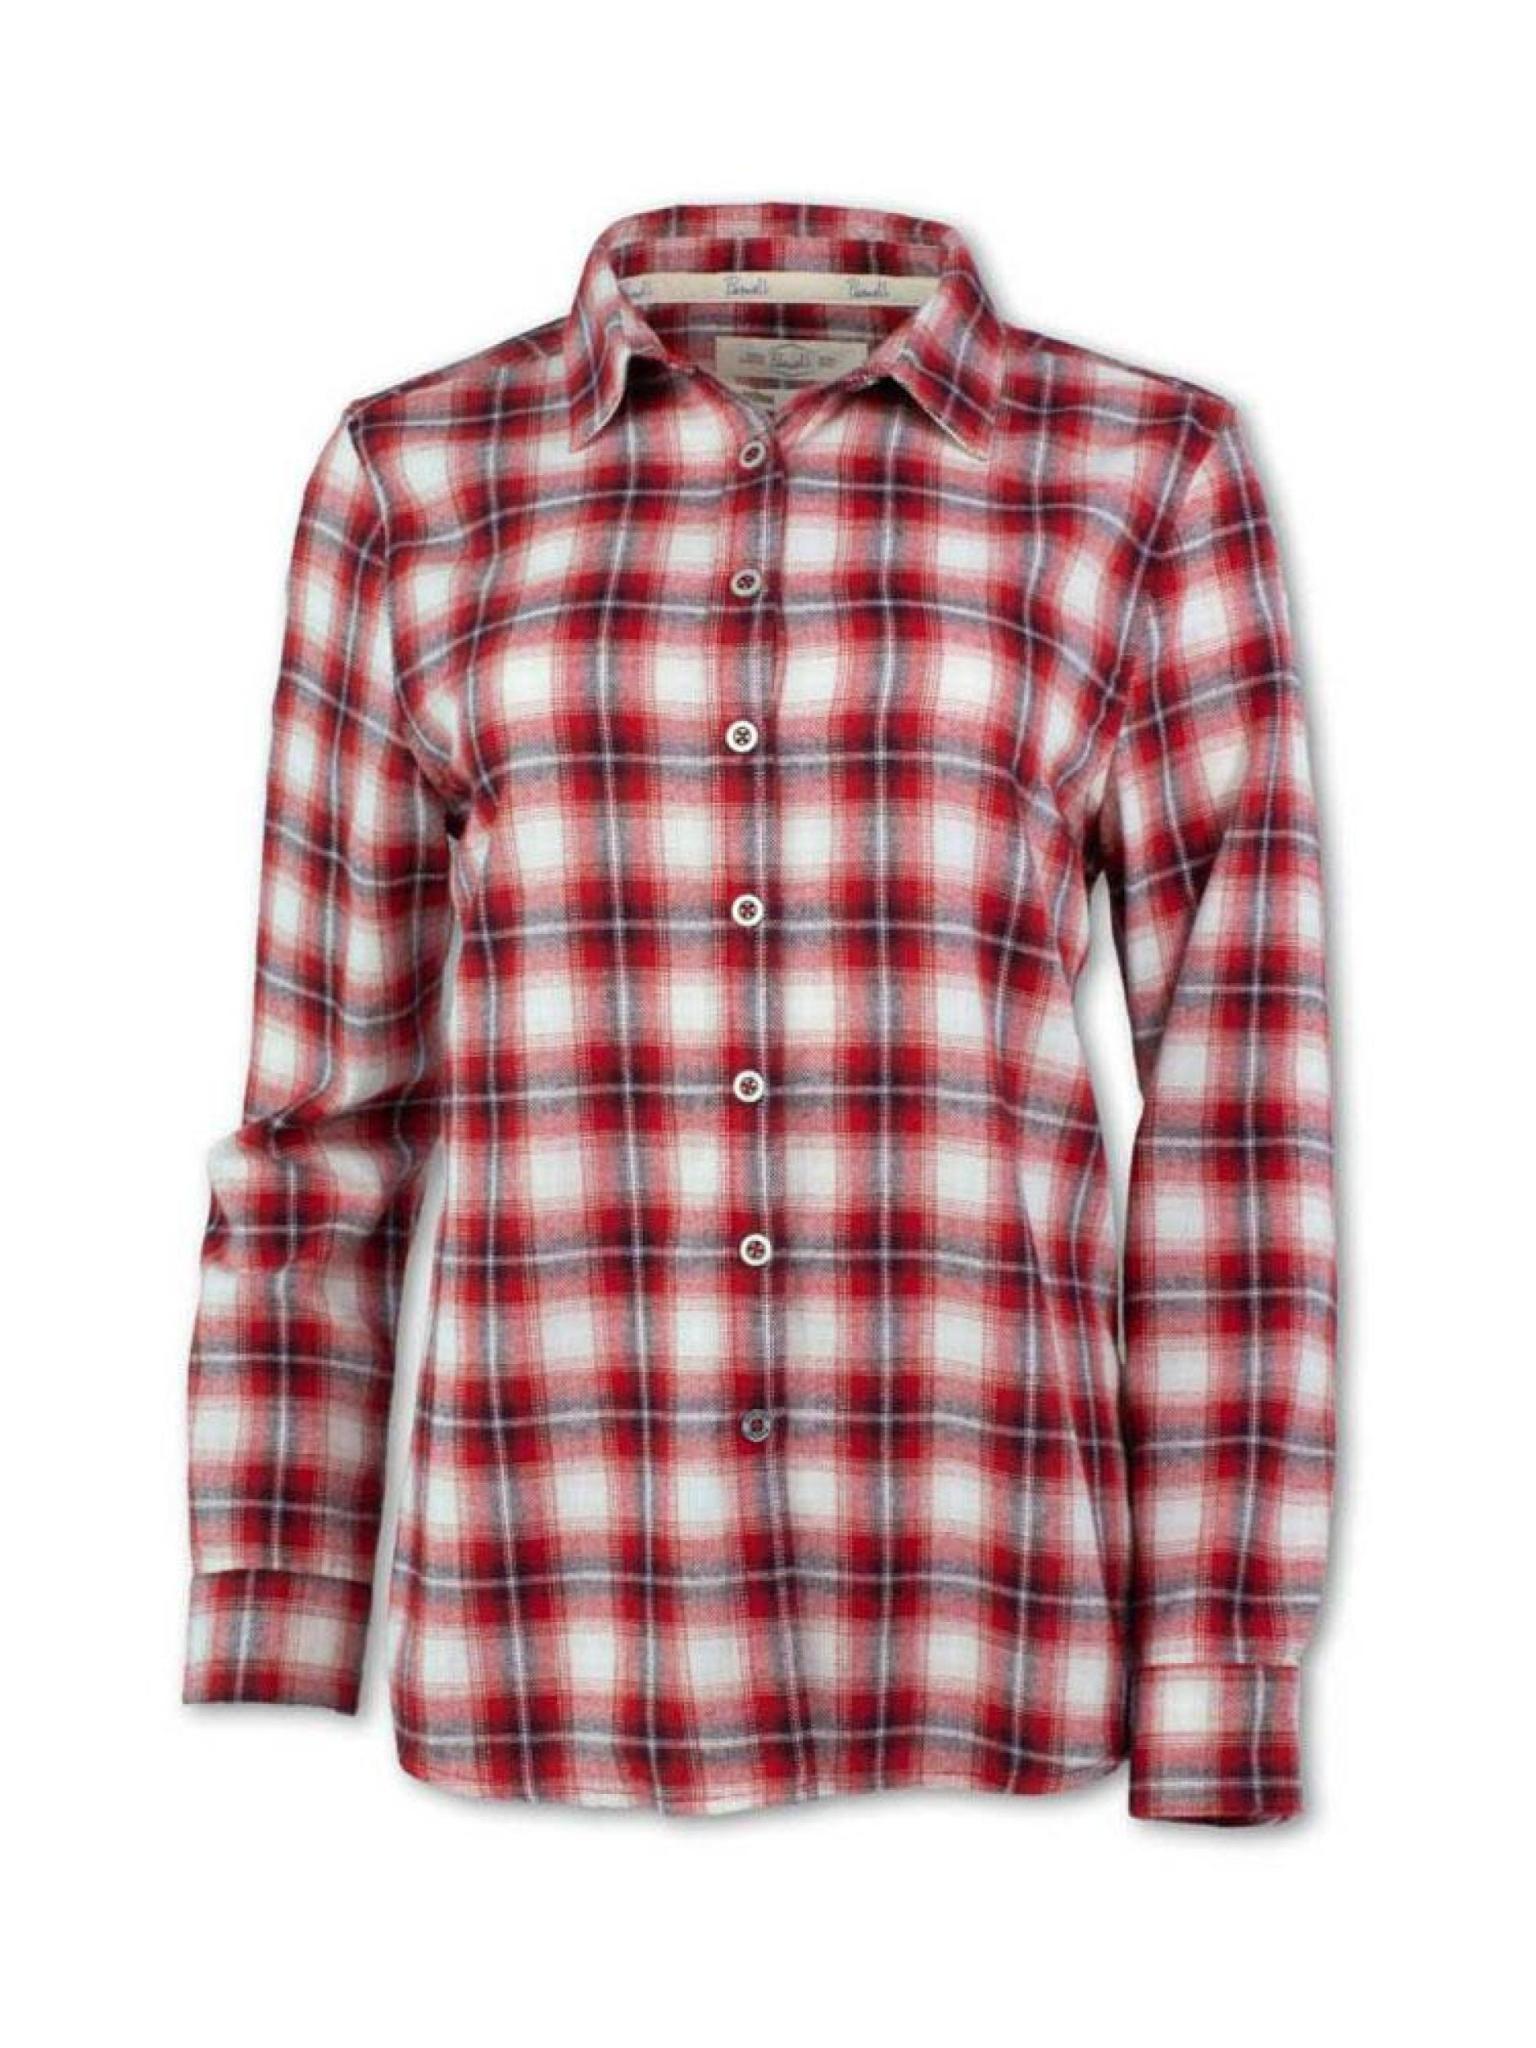 Purnell Women's Vintage Plaid Flannel